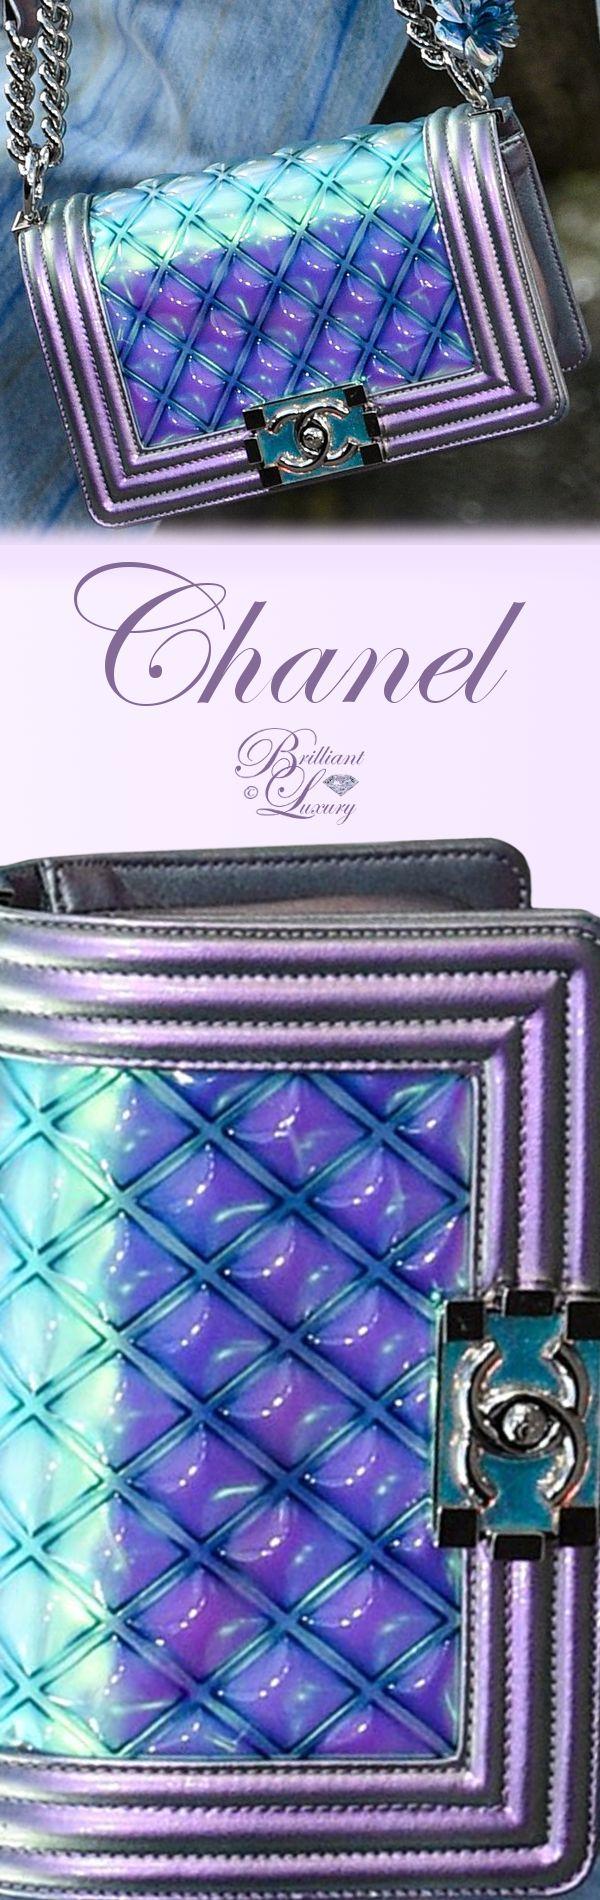 Brilliant Luxury ♦ new Chanel Flap bag 2018